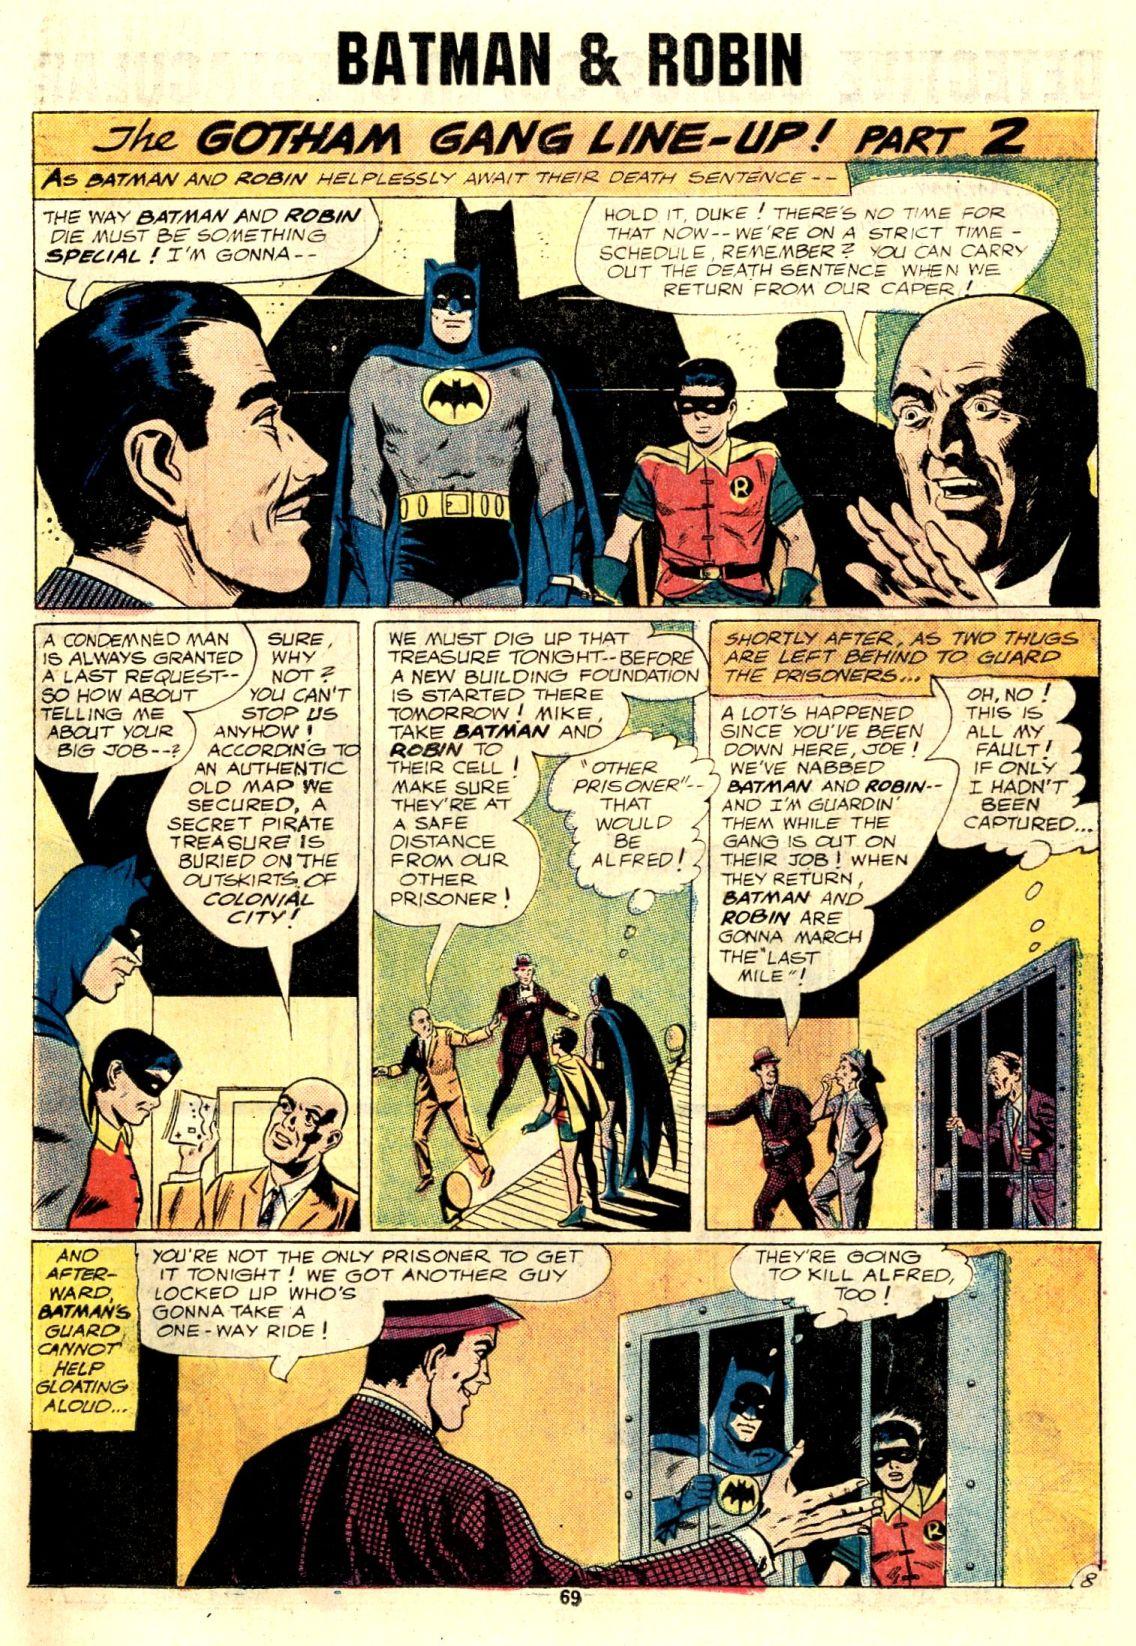 Detective Comics (1937) 438 Page 69